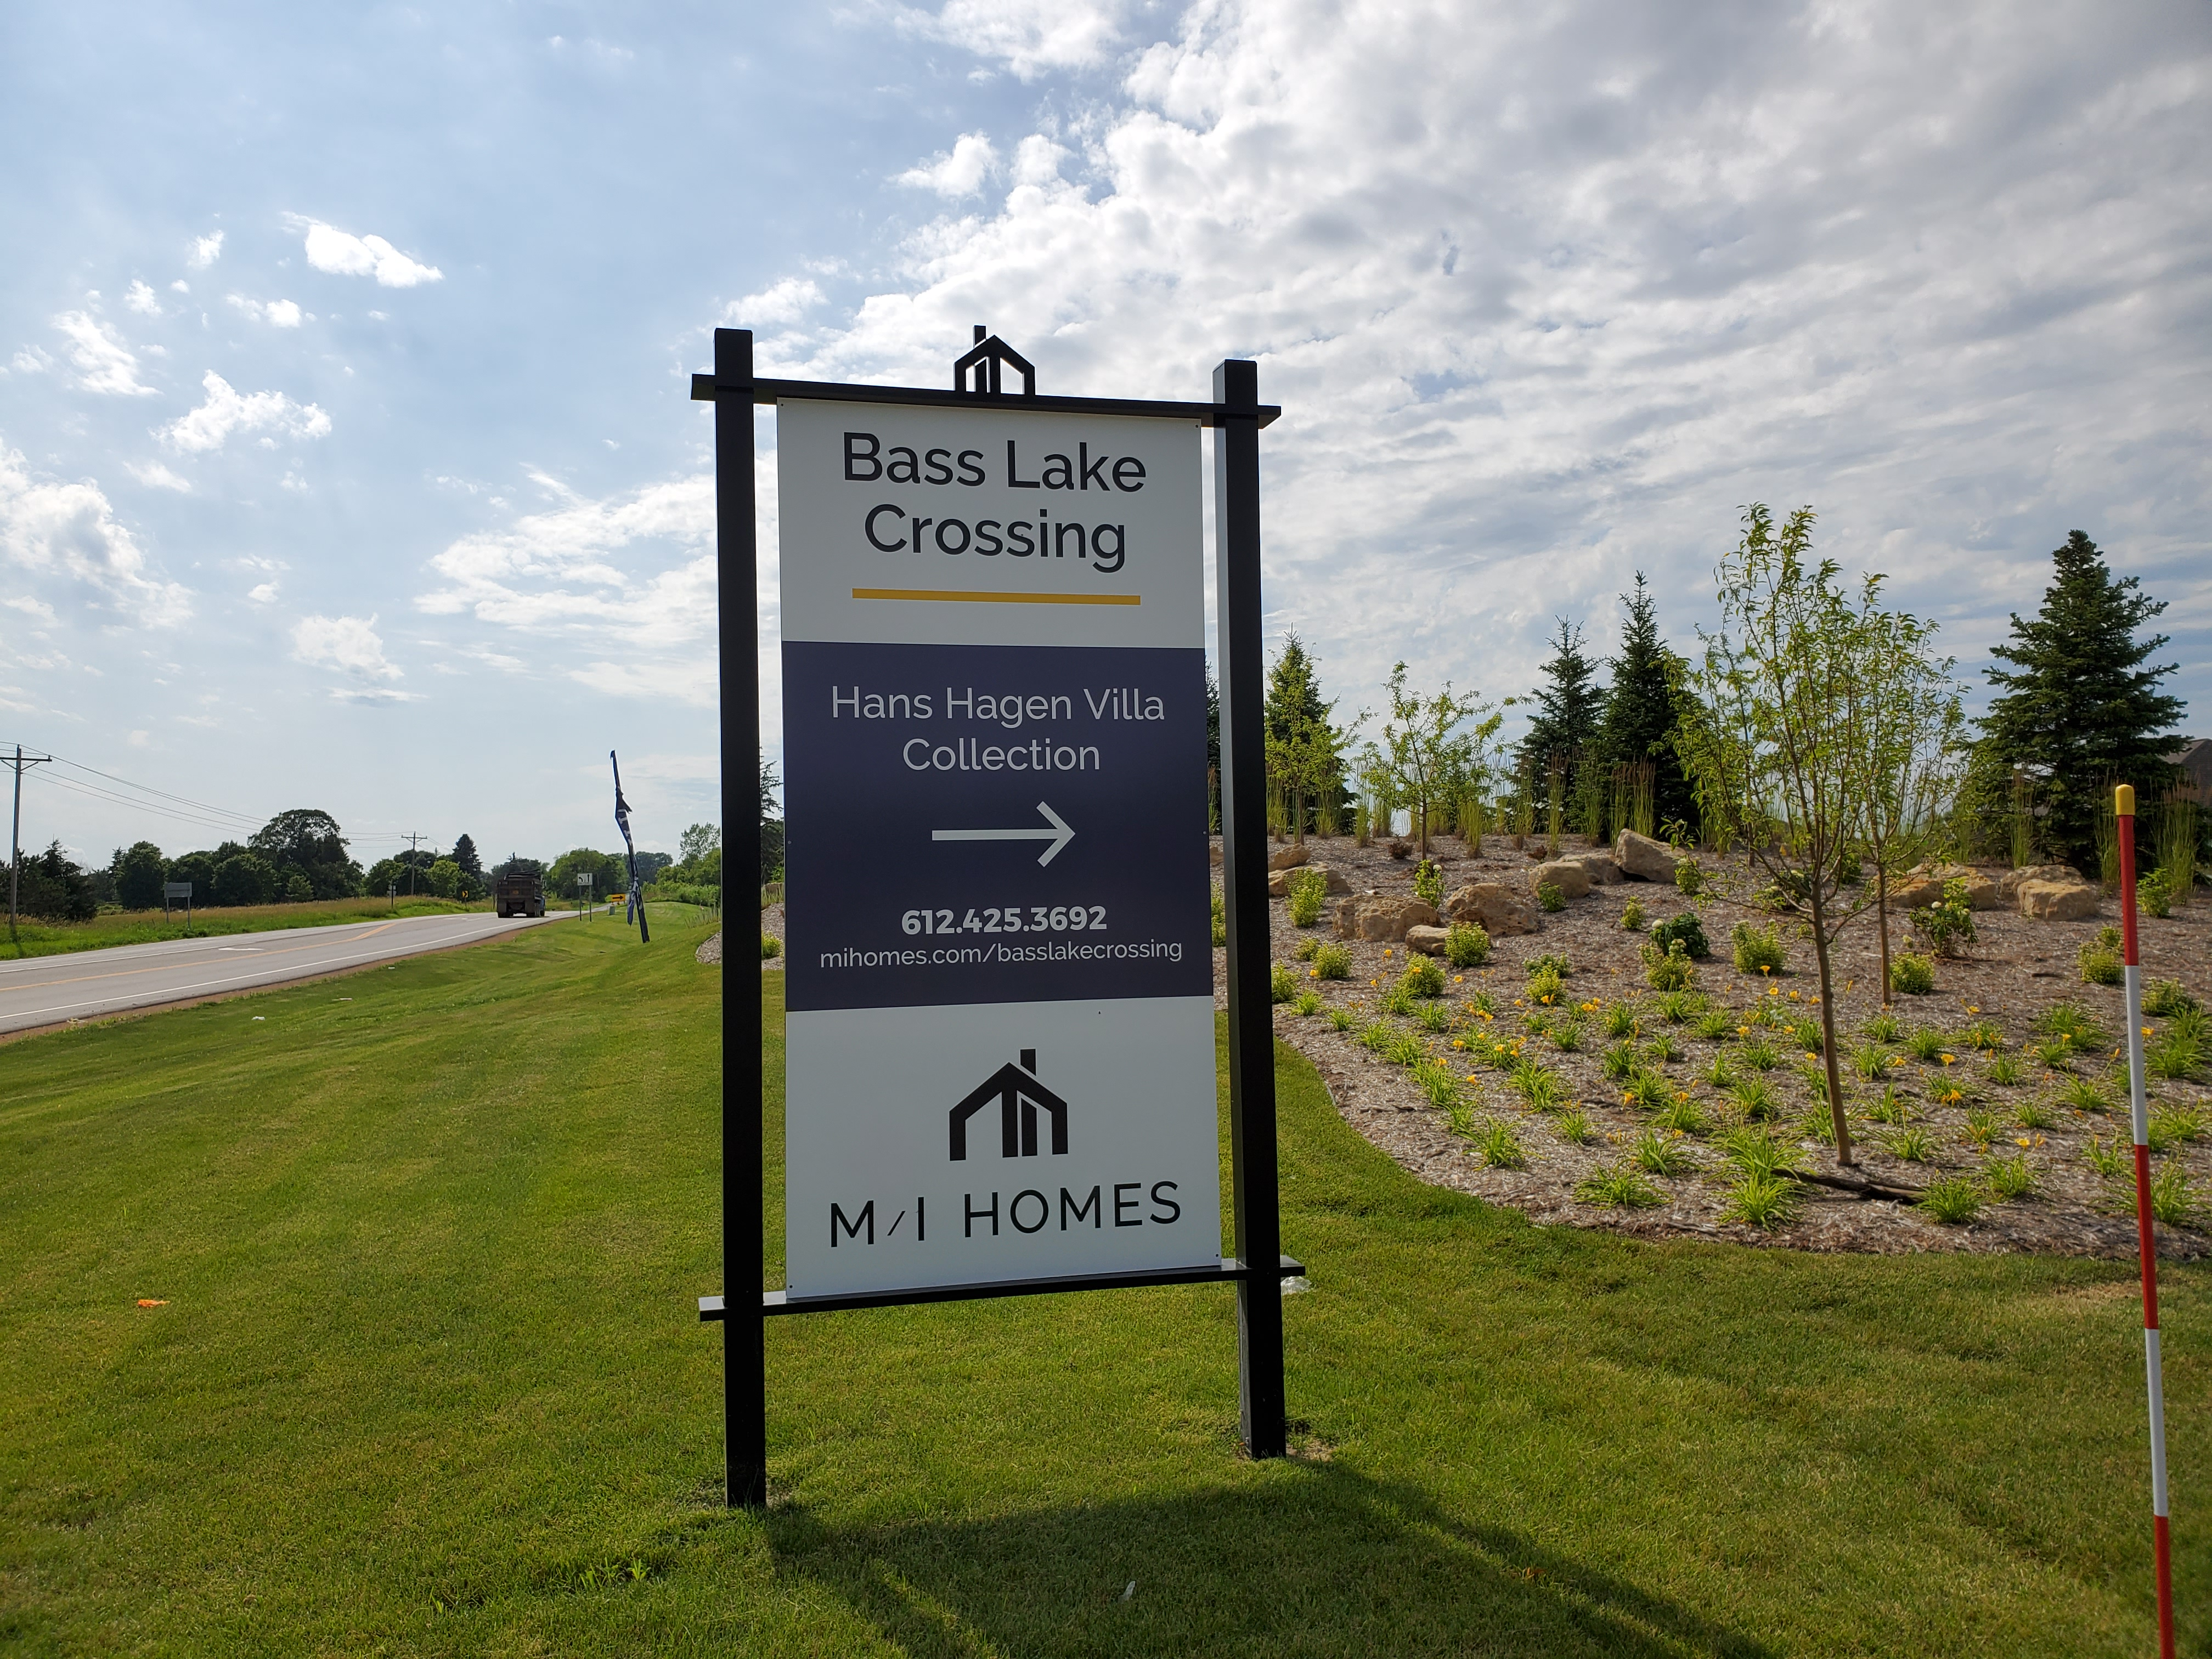 Bass Lake Crossing - Corcoran, MN - Doyle Real Estate Team